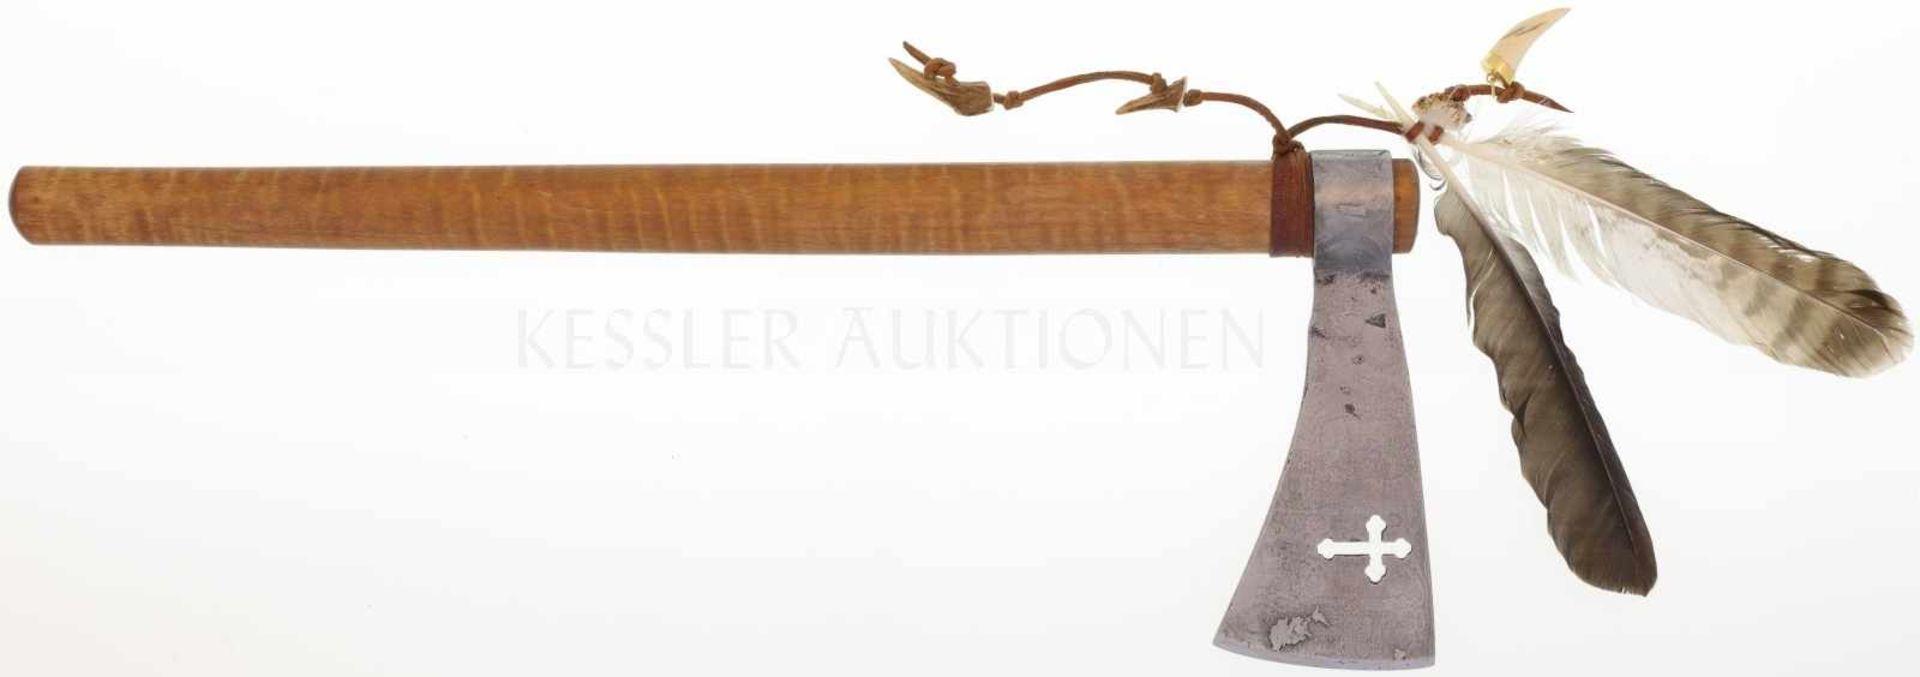 Tomahawk Replika, Bruno Jörg Meilen Handgeschmiedetes Blatt und Haus aus Damaststahl, rechtsseitig